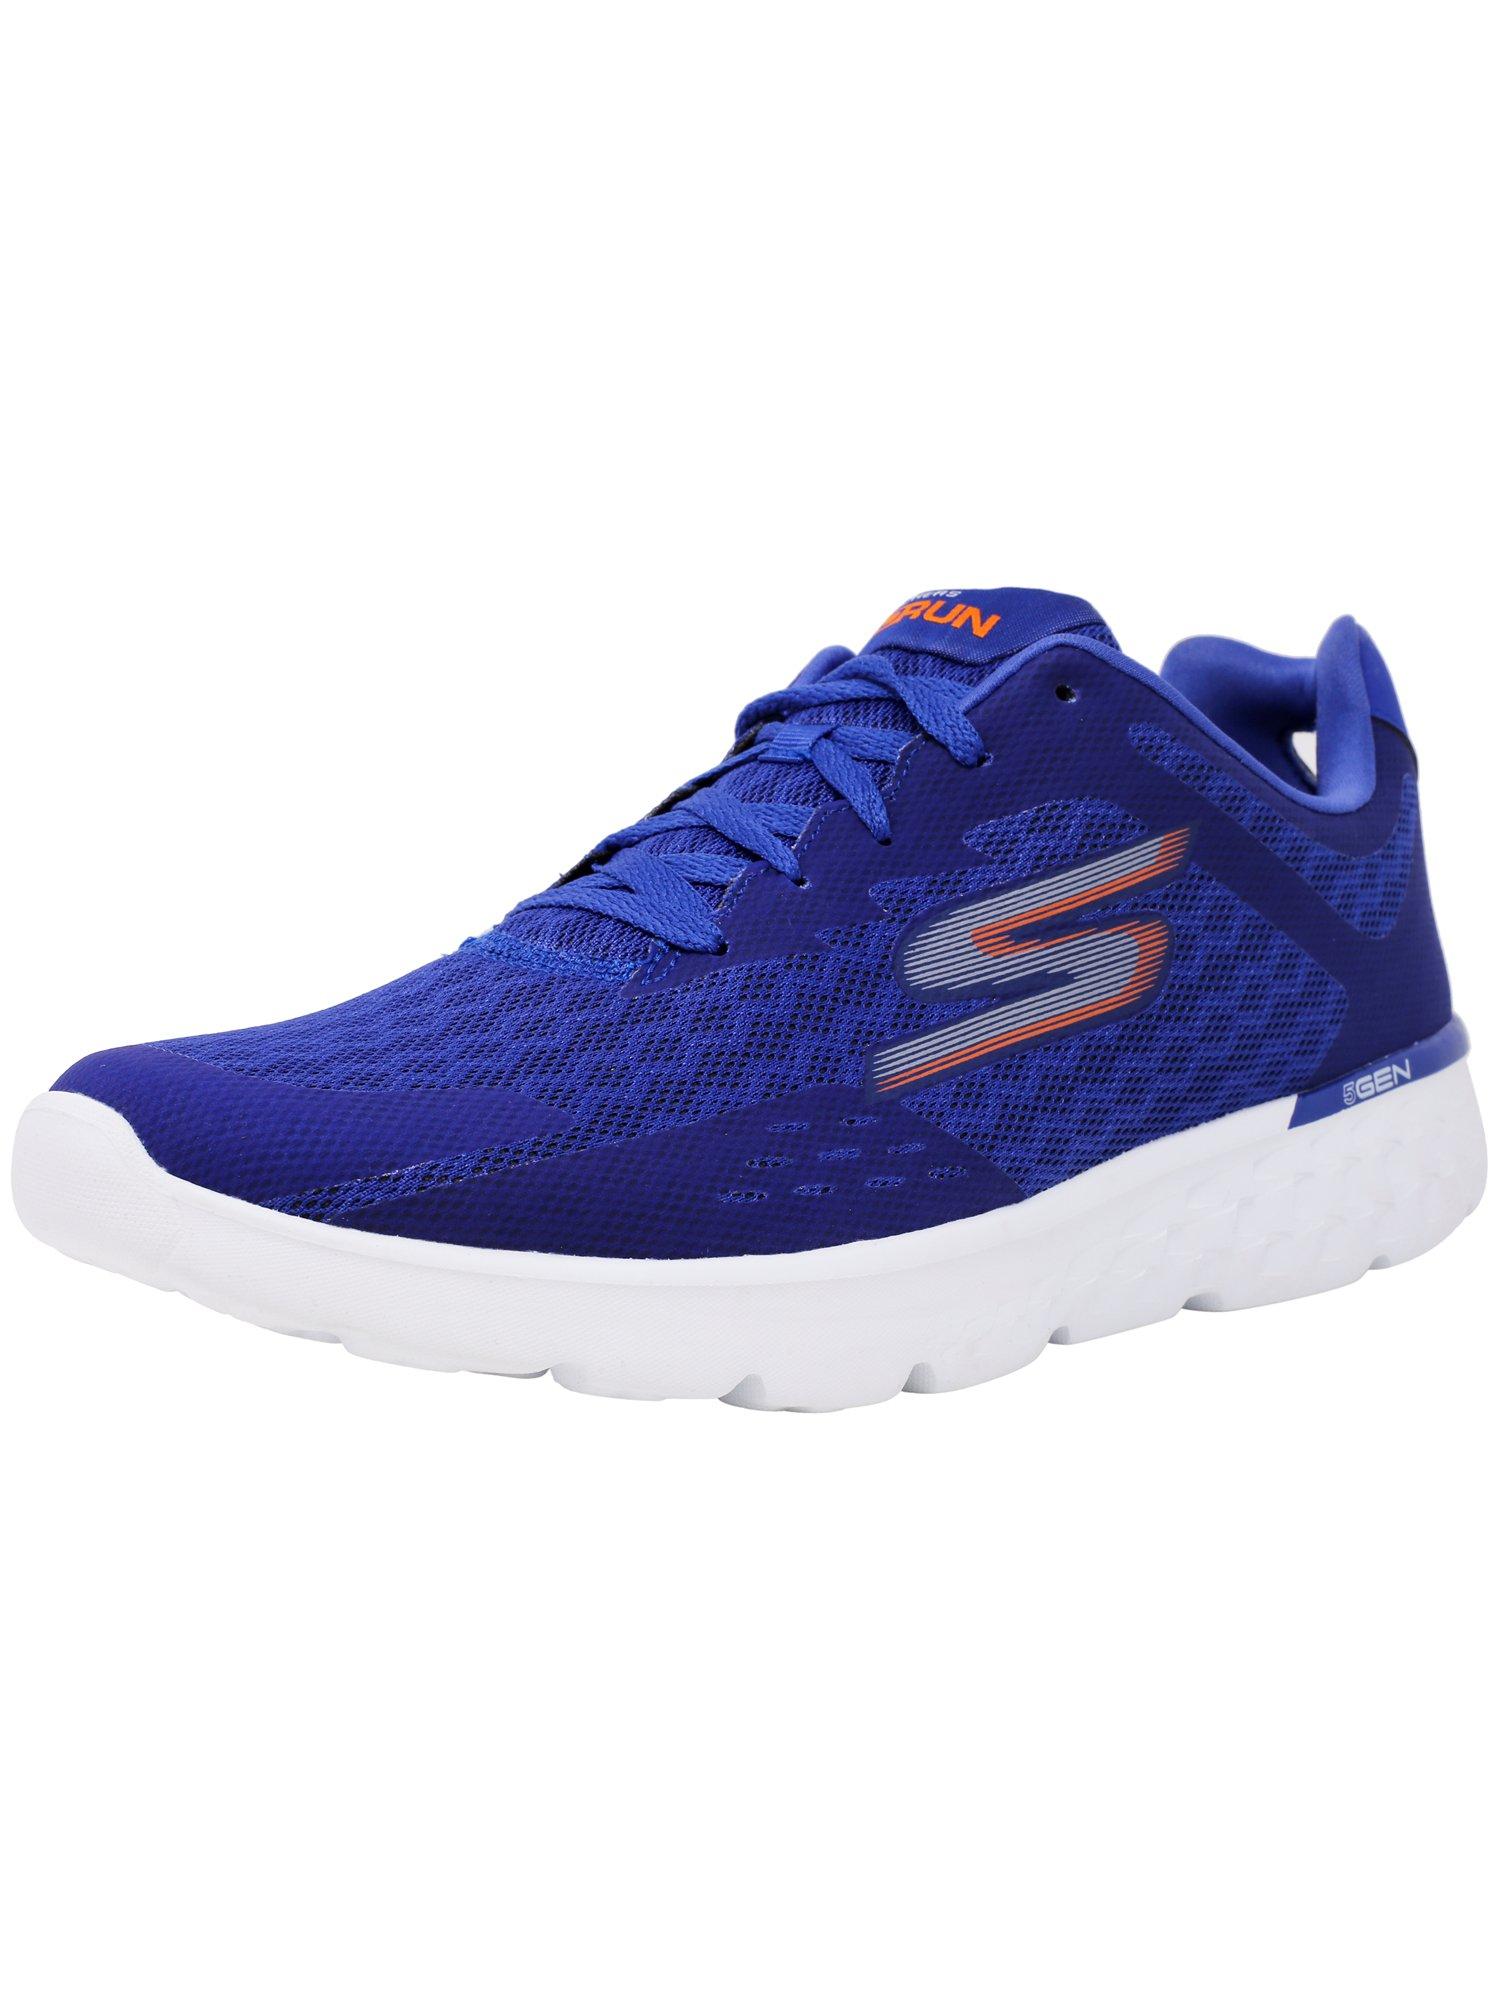 Skechers Men's Go Run 400 - Disperse Blue / Orange Ankle-High Running Shoe 11.5M